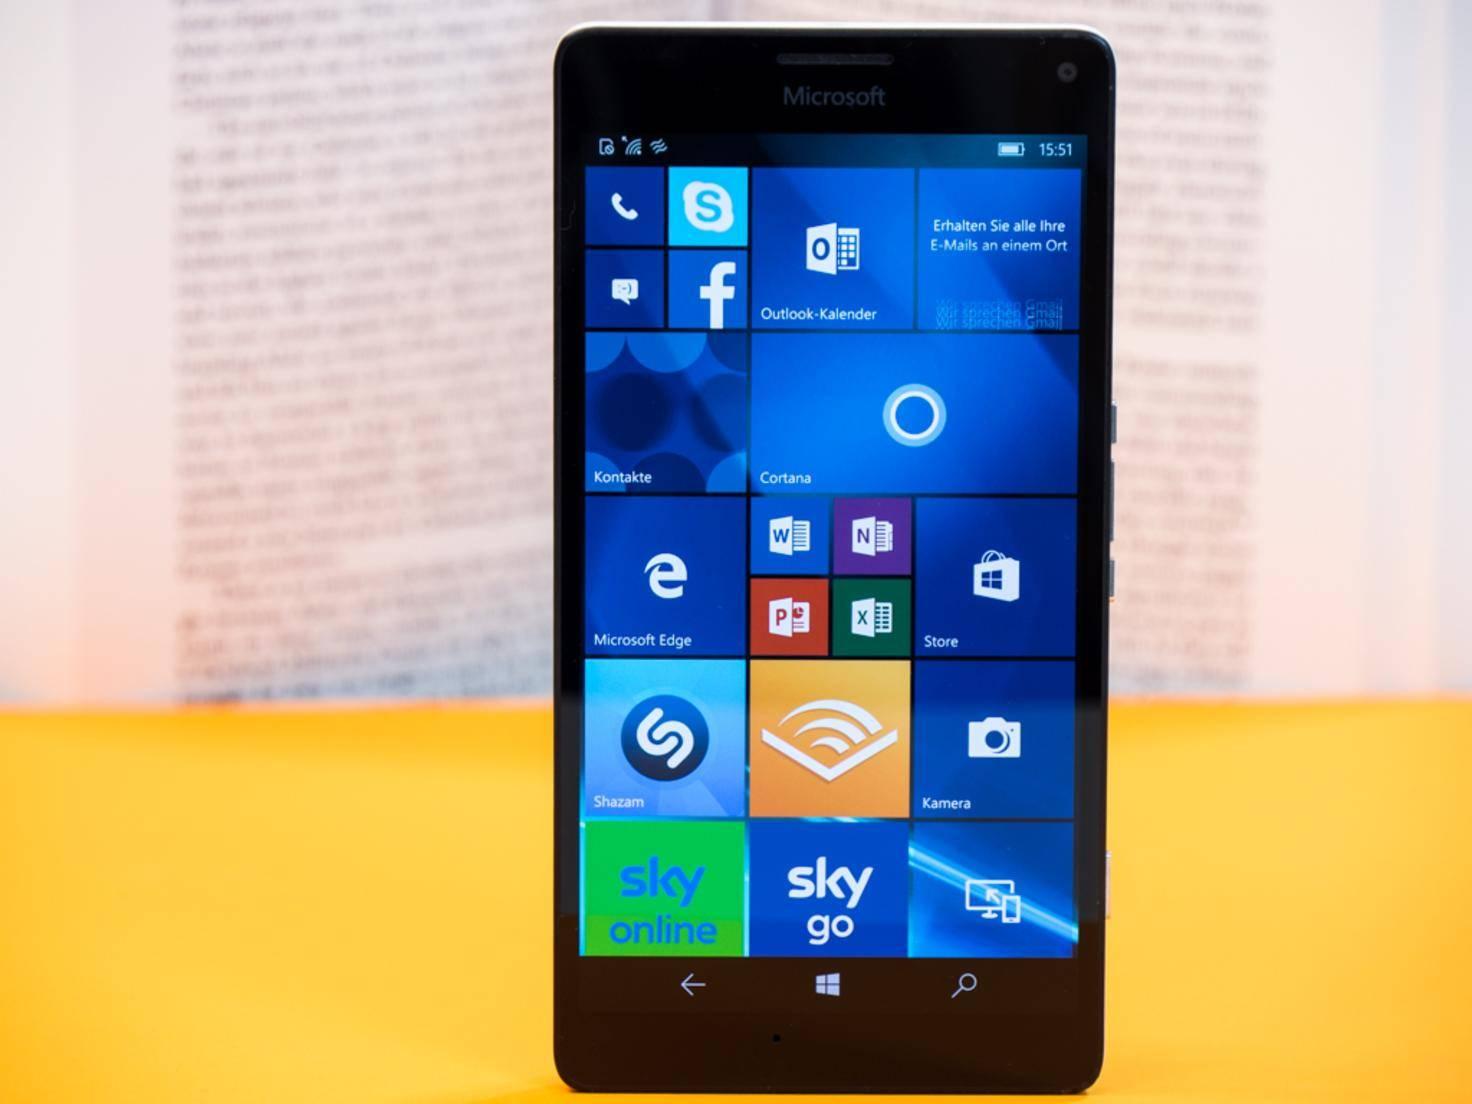 Fotos_Lumia950XL-16